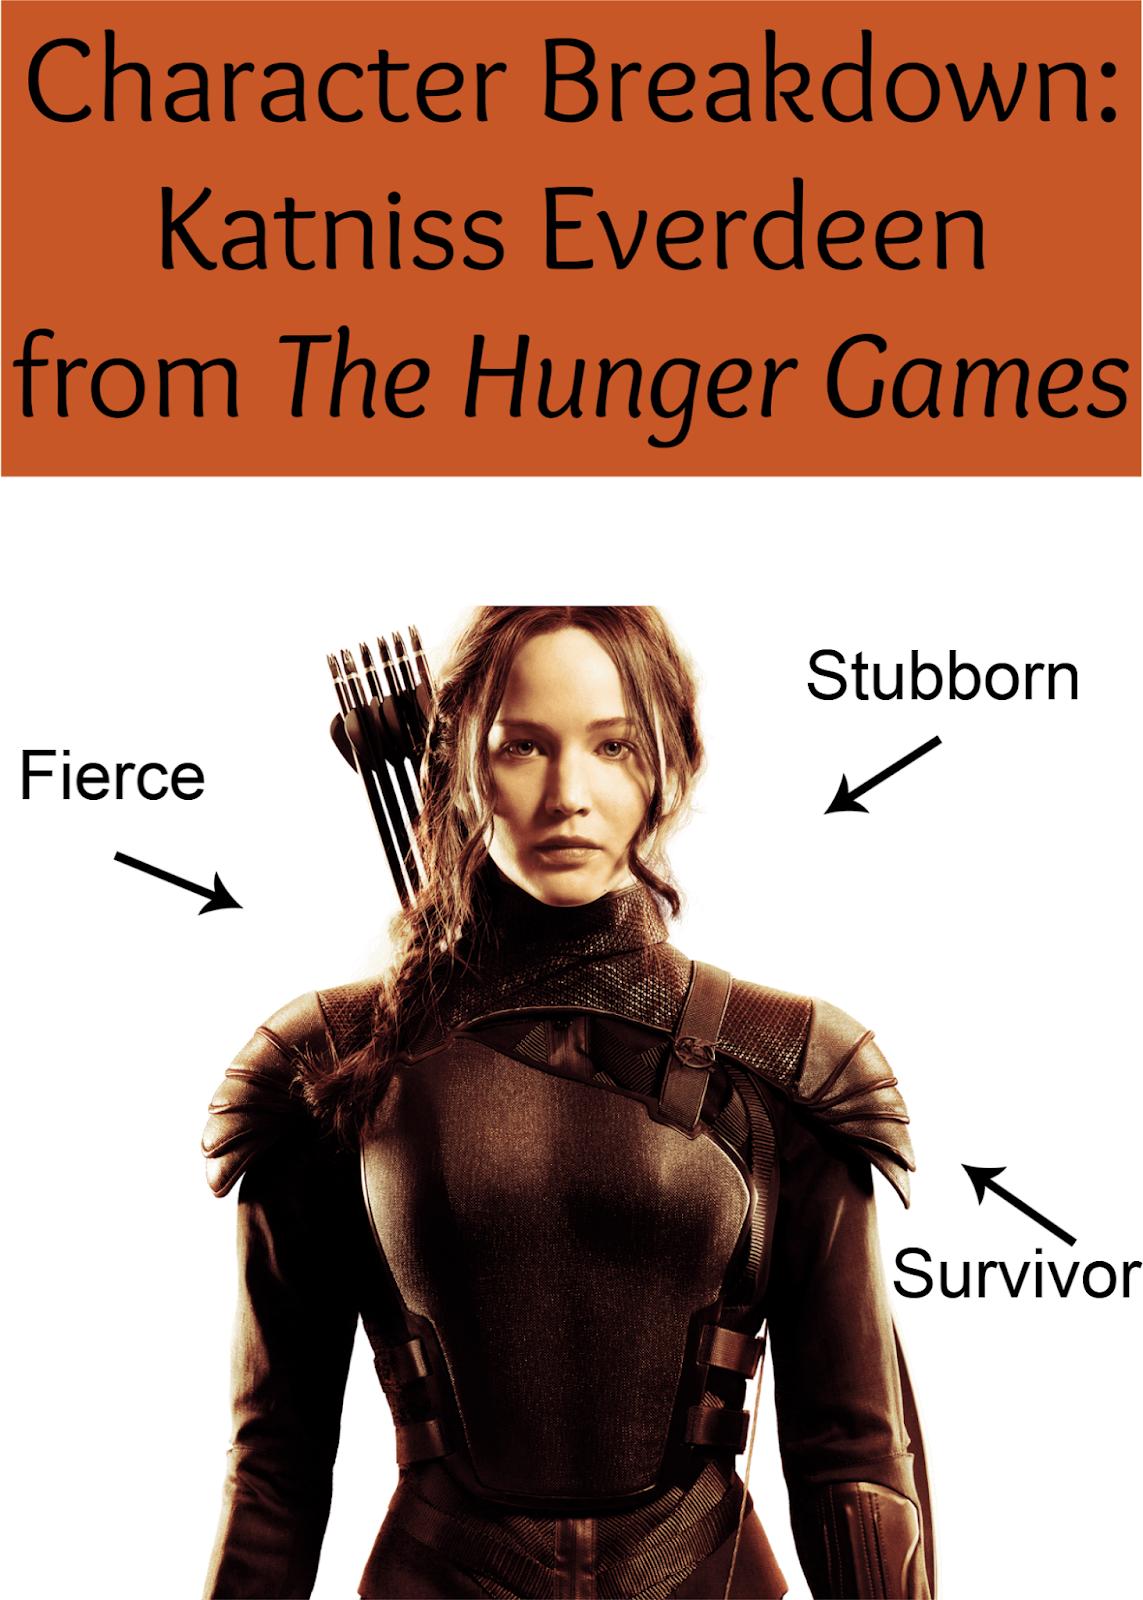 I want that dress | Hunger games fashion, Mockingjay, The